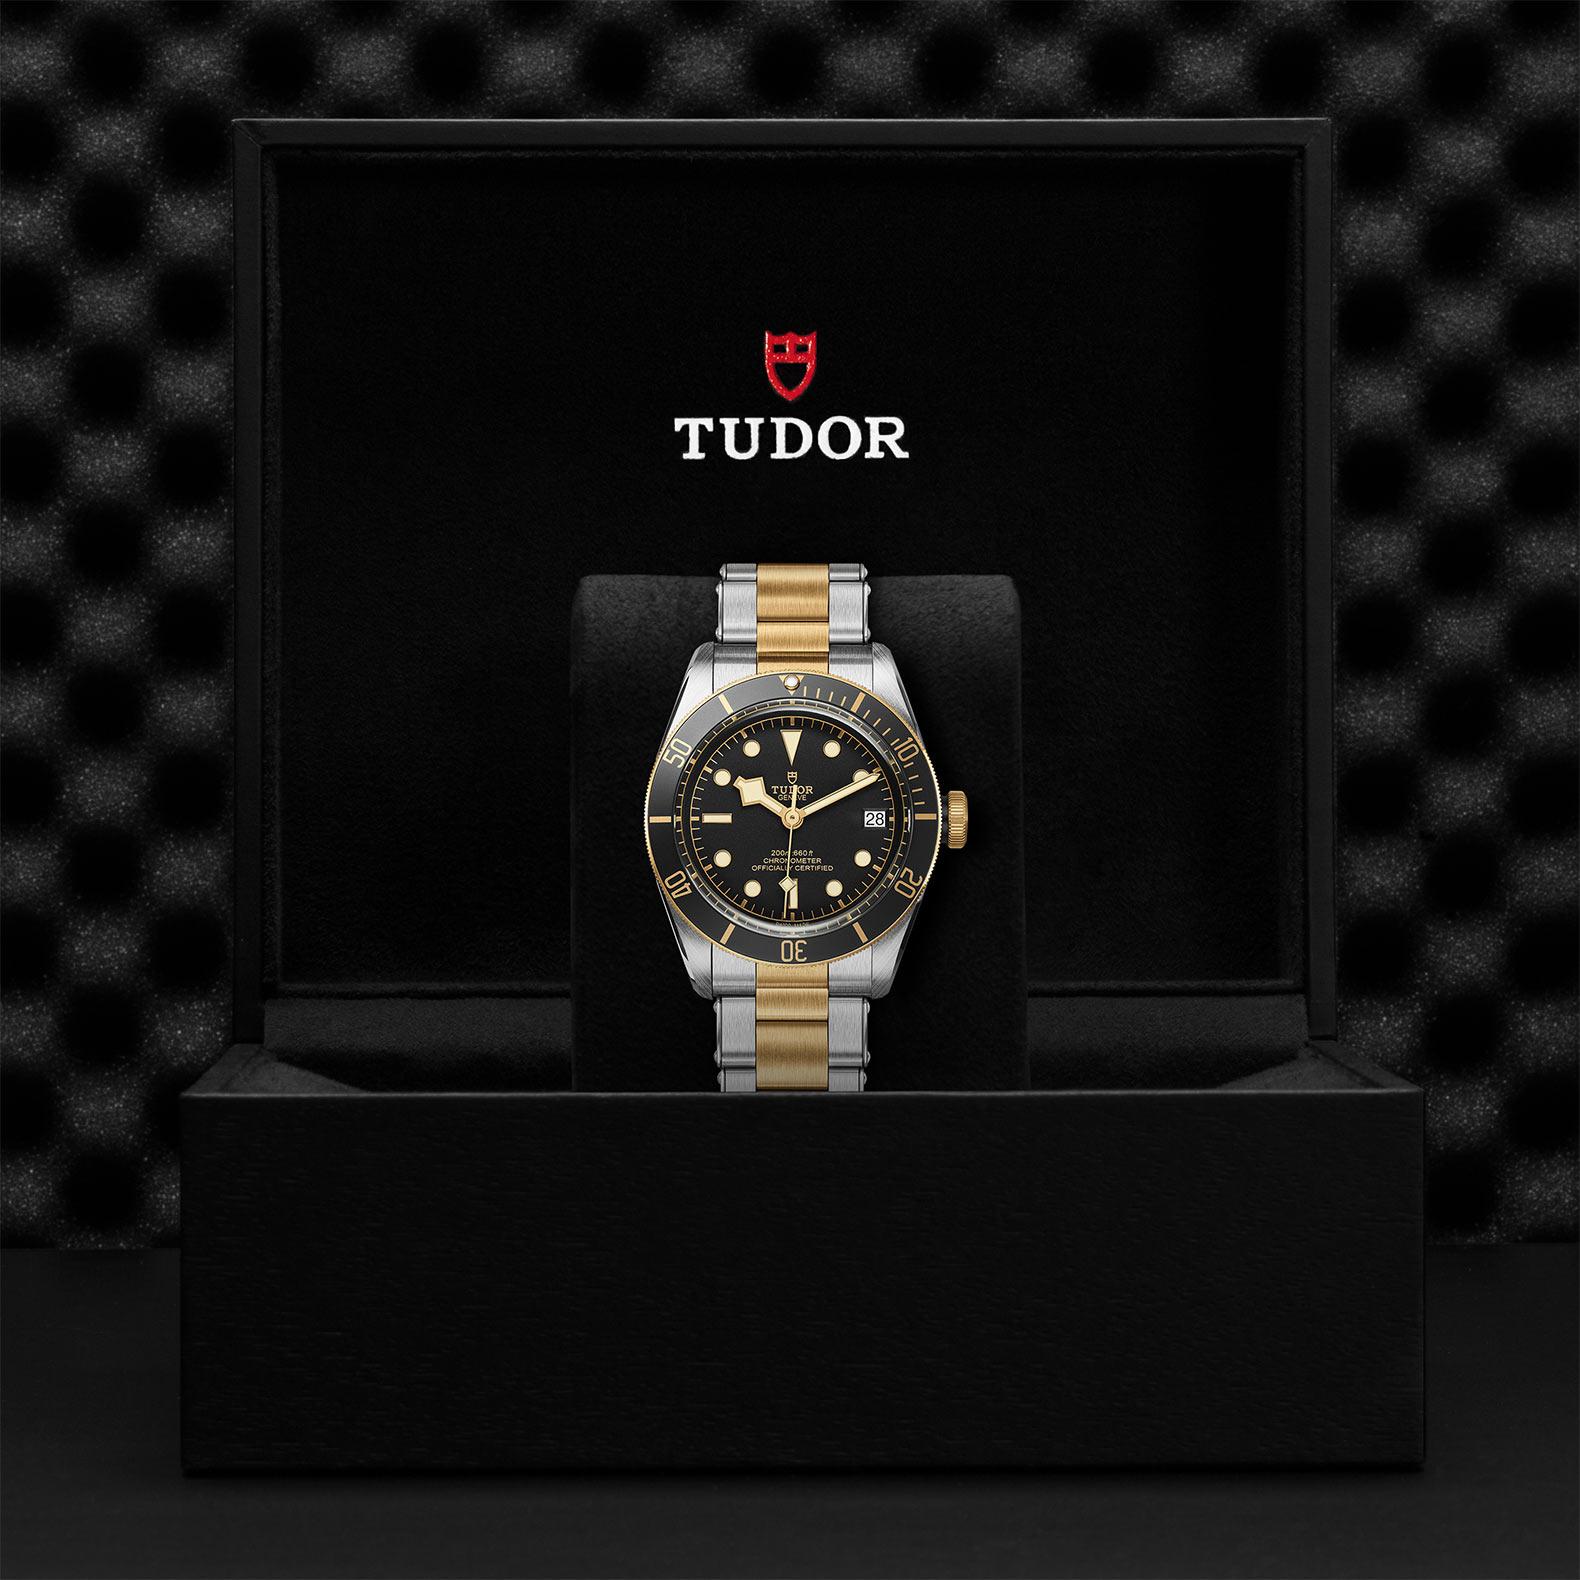 Tudor_M79733n-0008